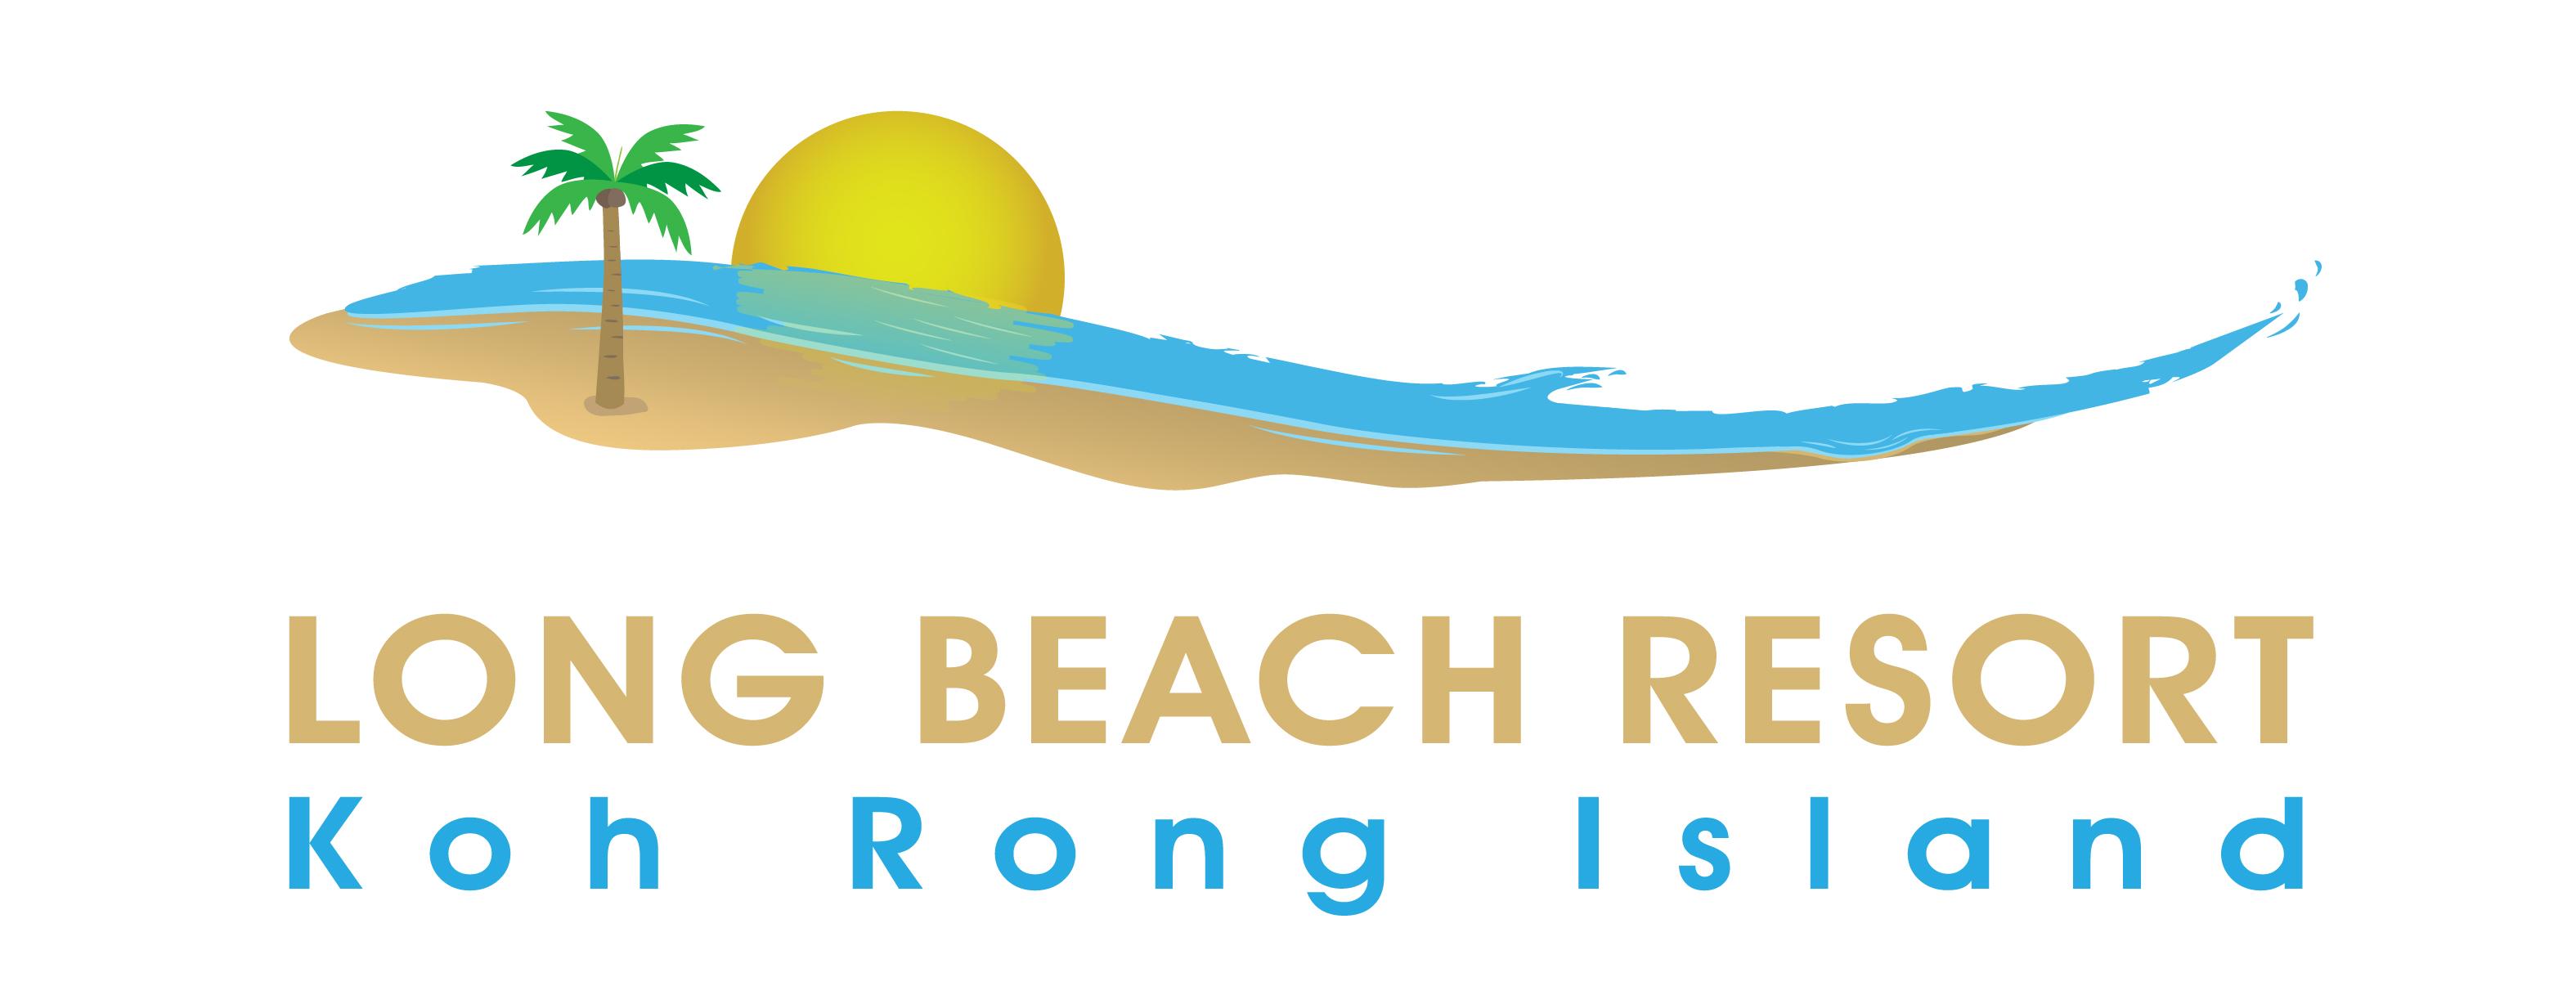 Long Beach Resort Koh Rong